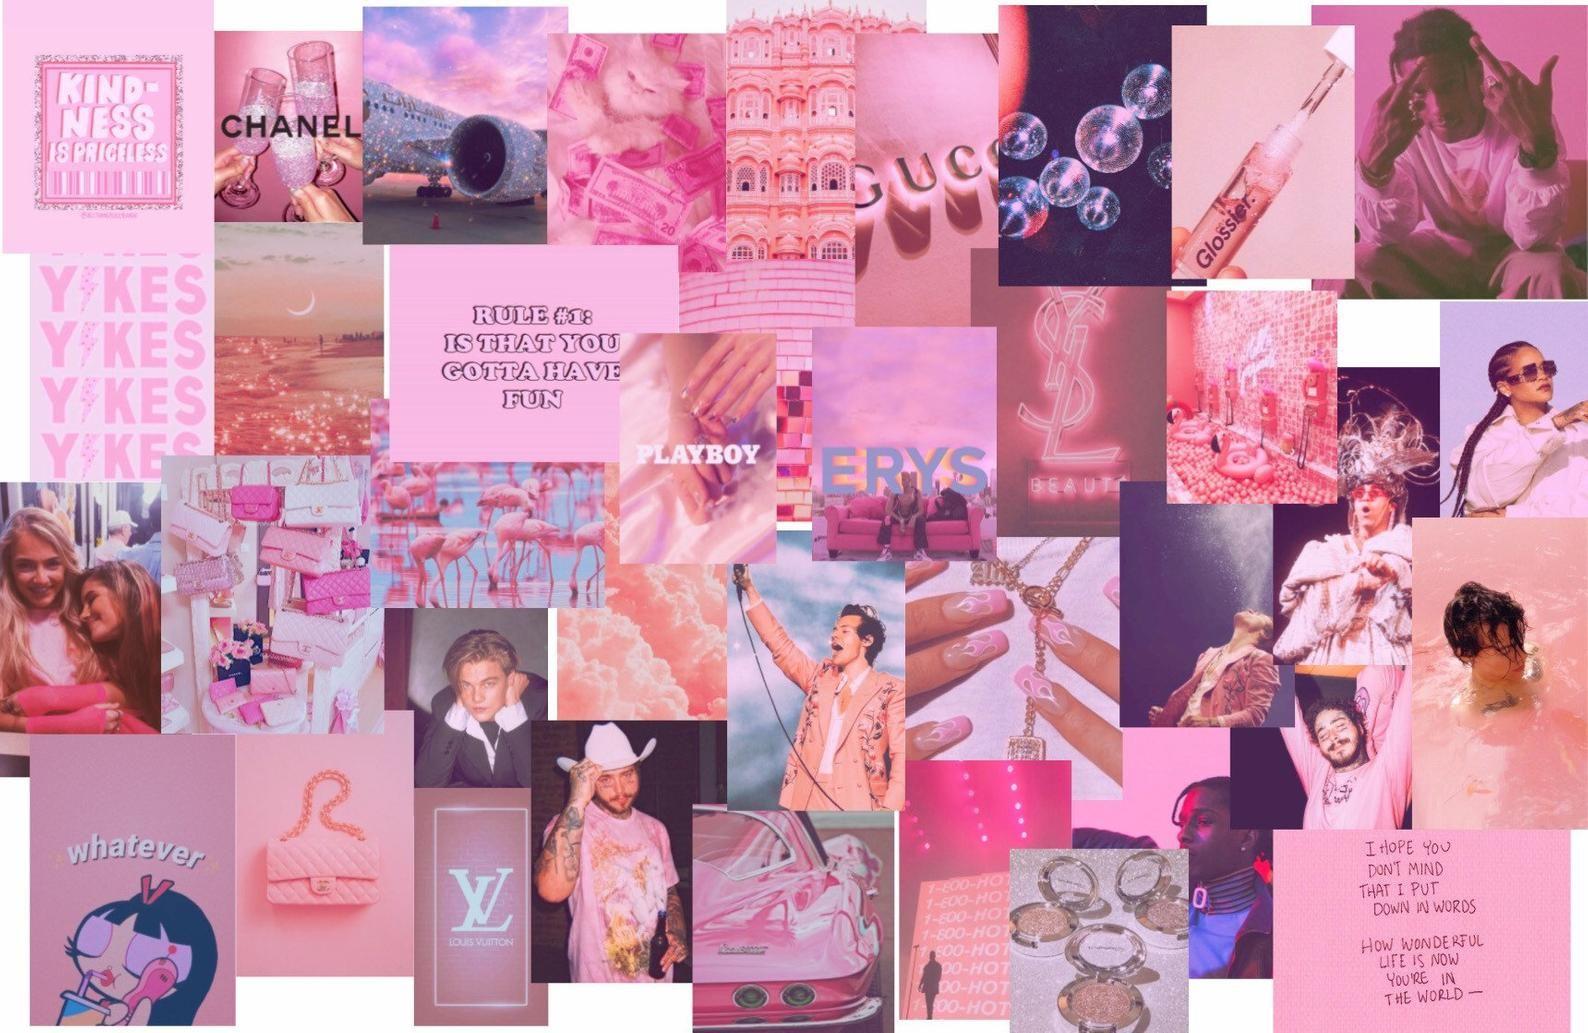 Pink Collage Computer Wallpaper Pink Collage Computer Wallpaper Novocom Top pink collage computer wallpaper